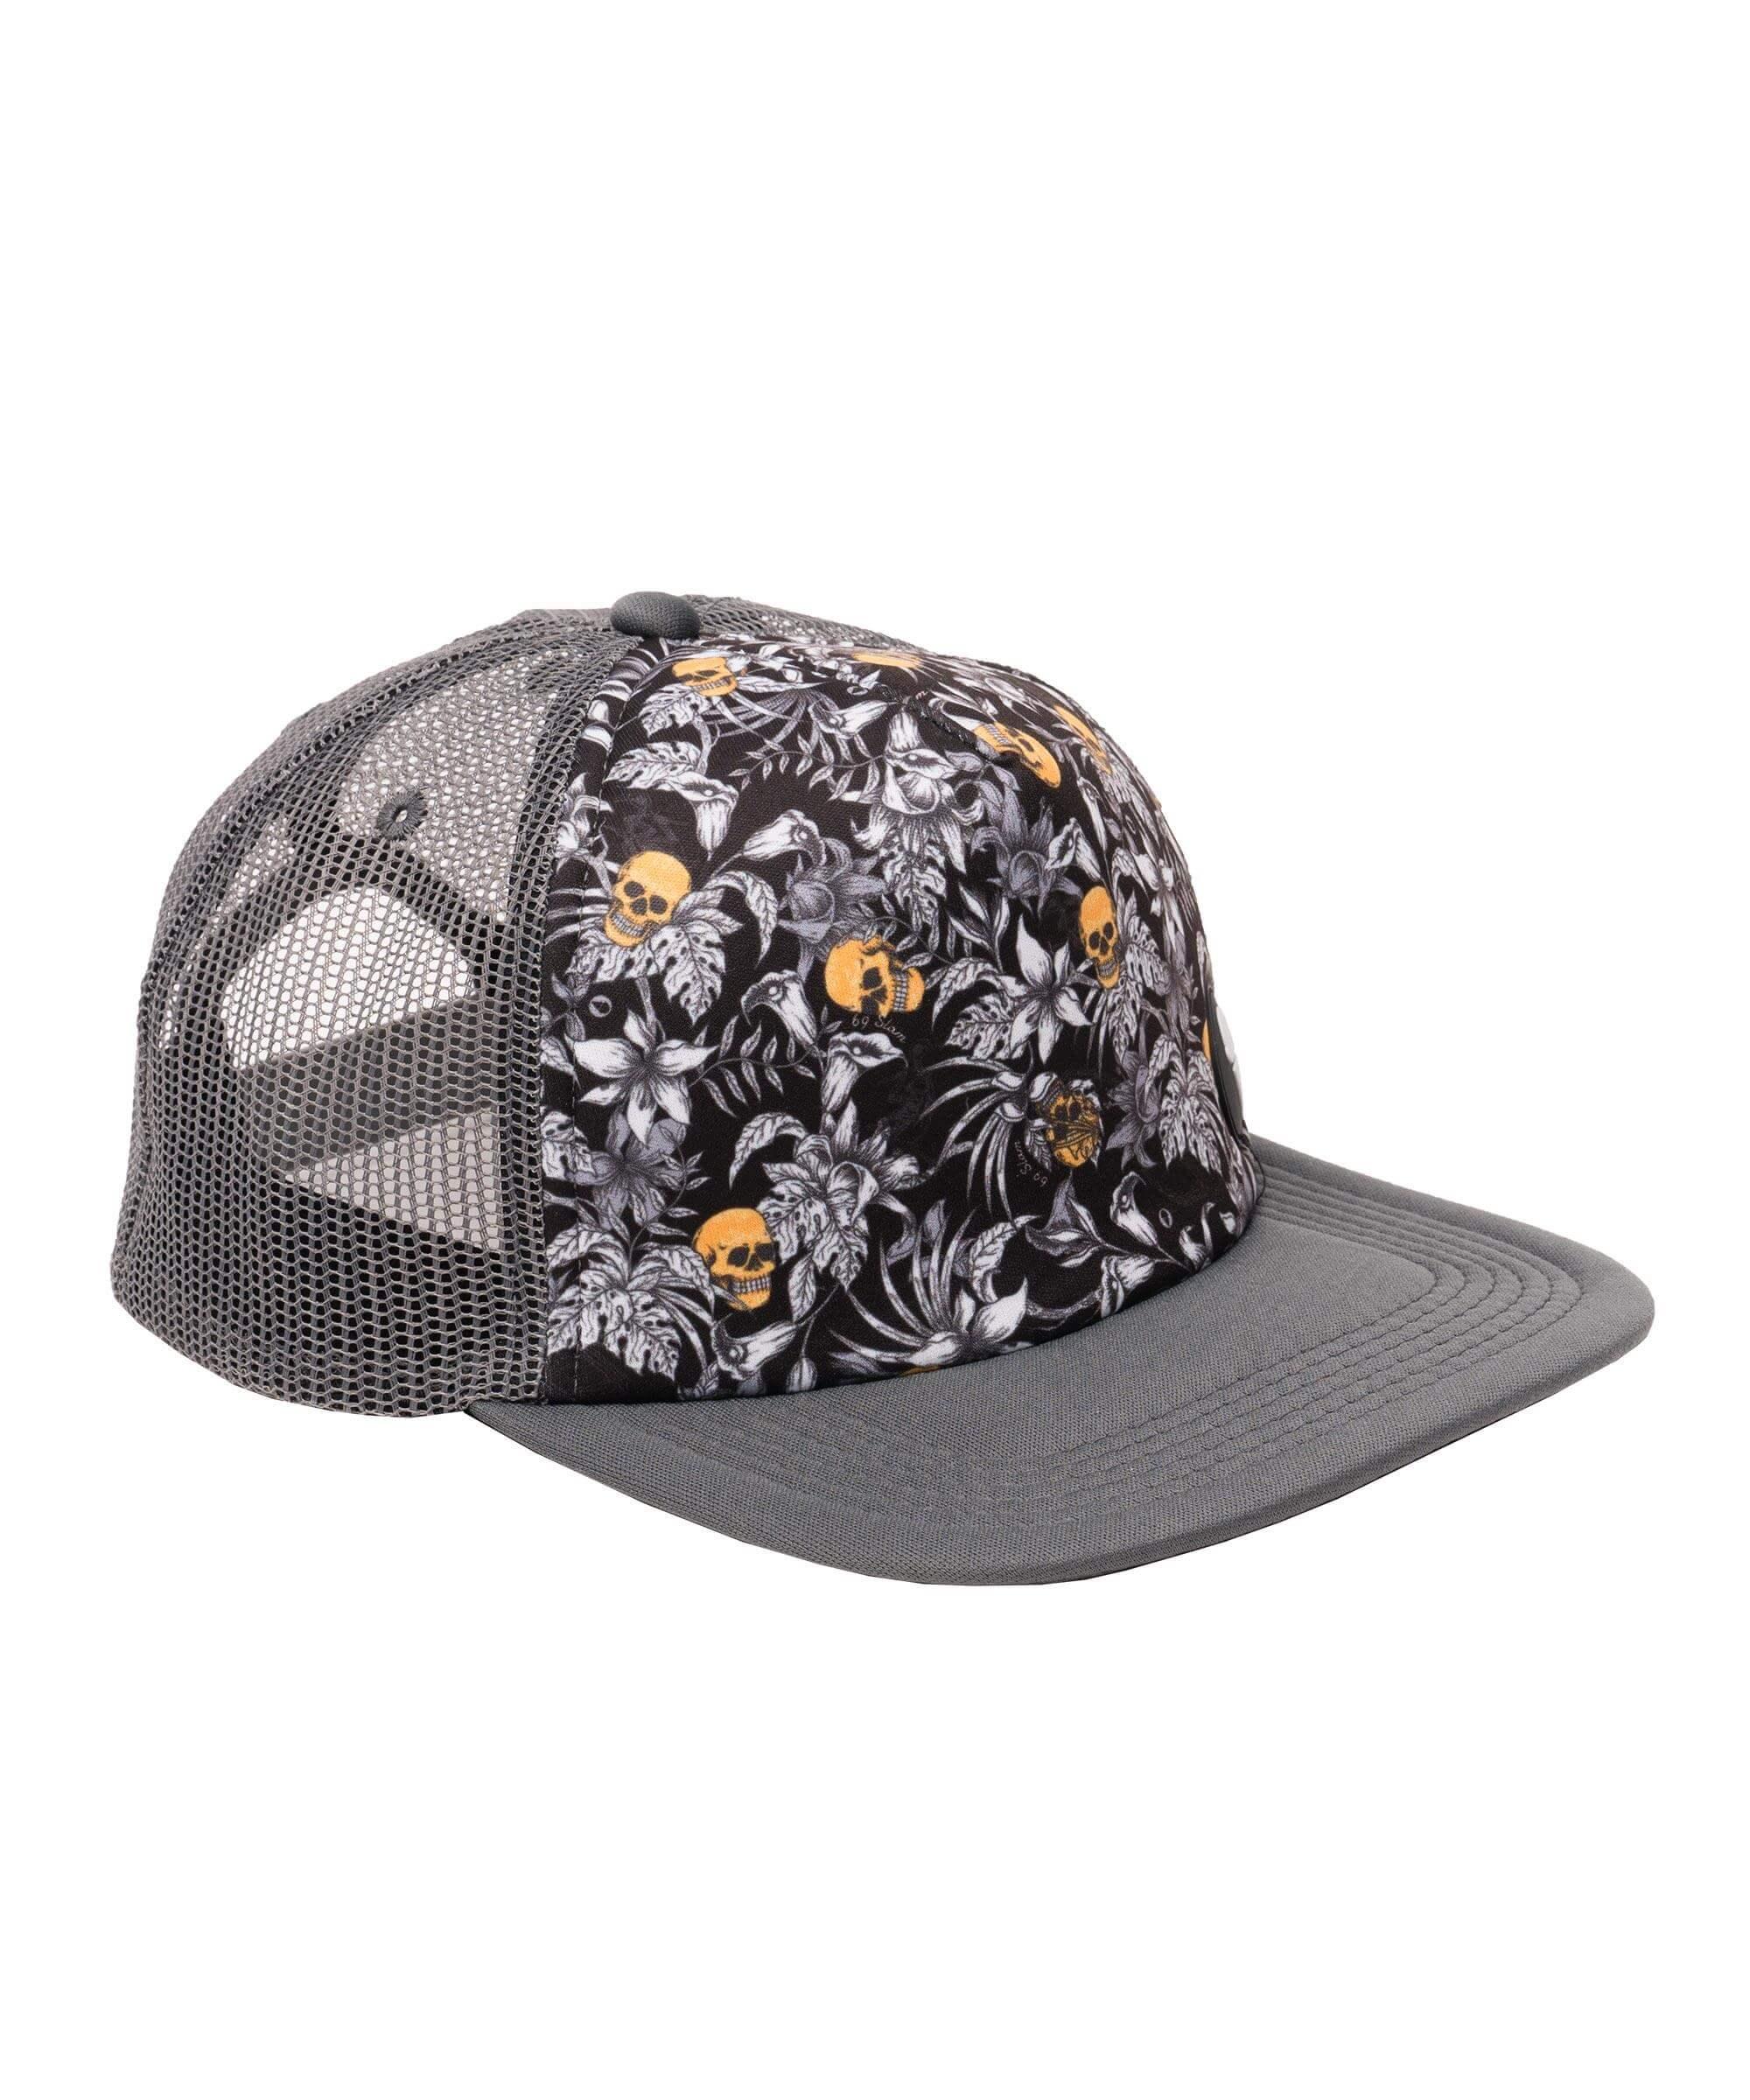 WILD GARDEN CAP